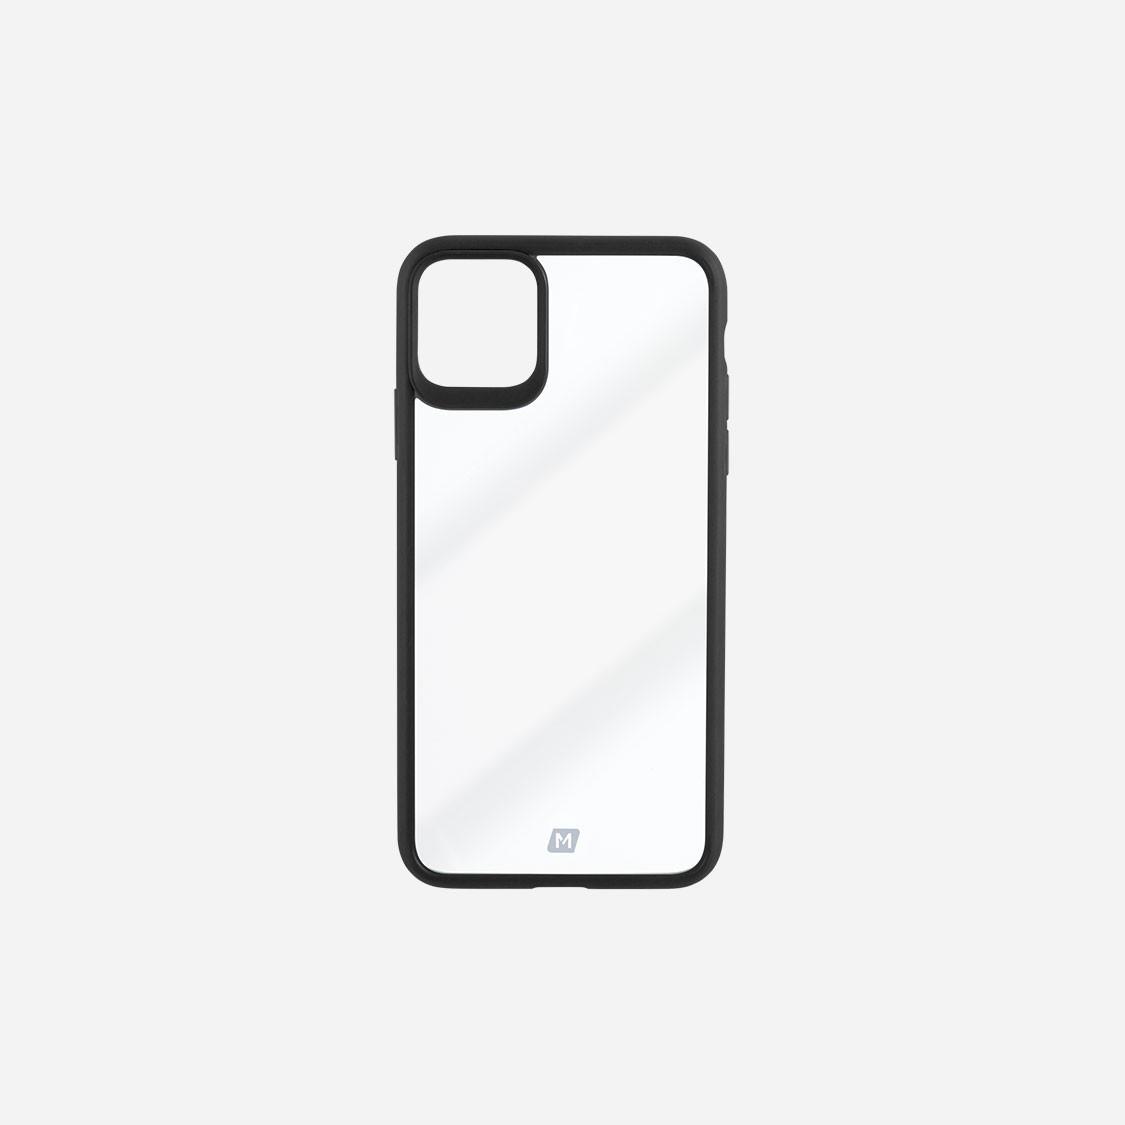 Capa Momax Hybrid case Compatível com iPhone 11 Pro